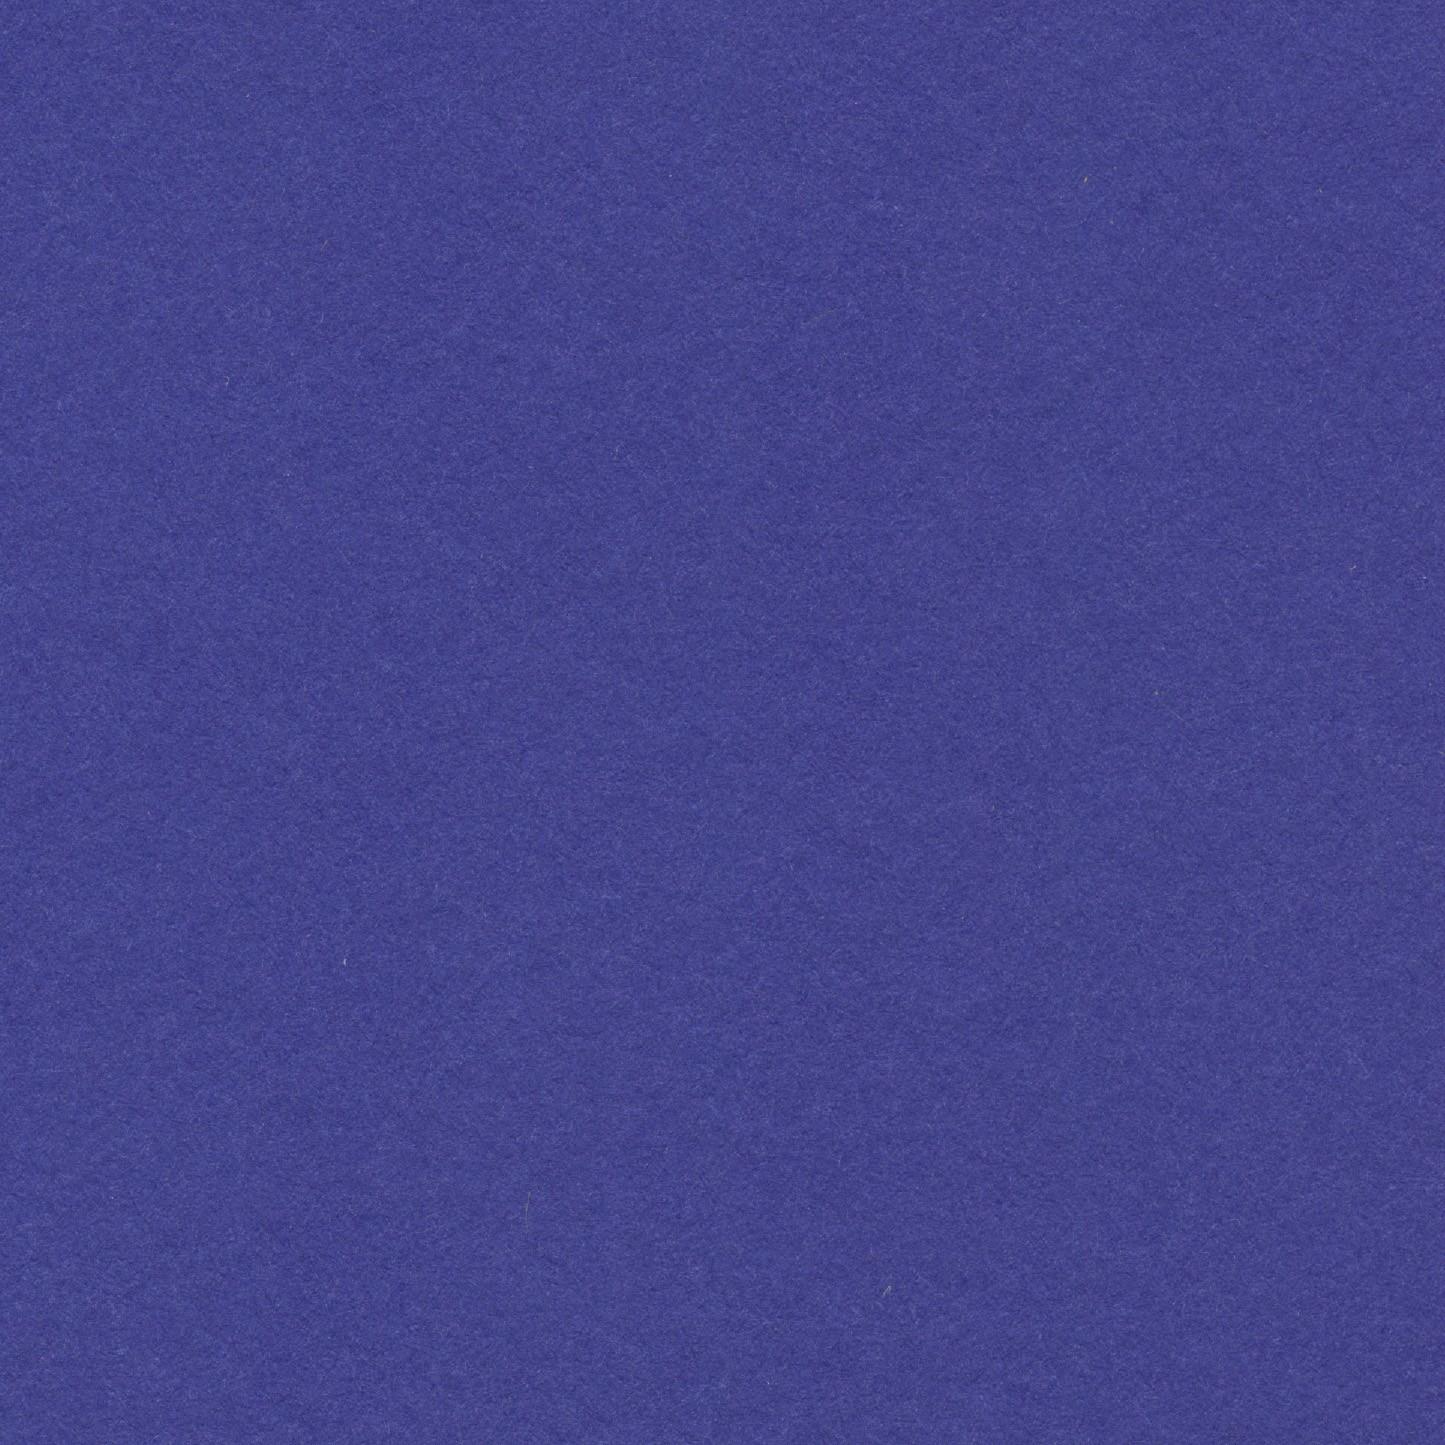 Blue - Regal 135gsm